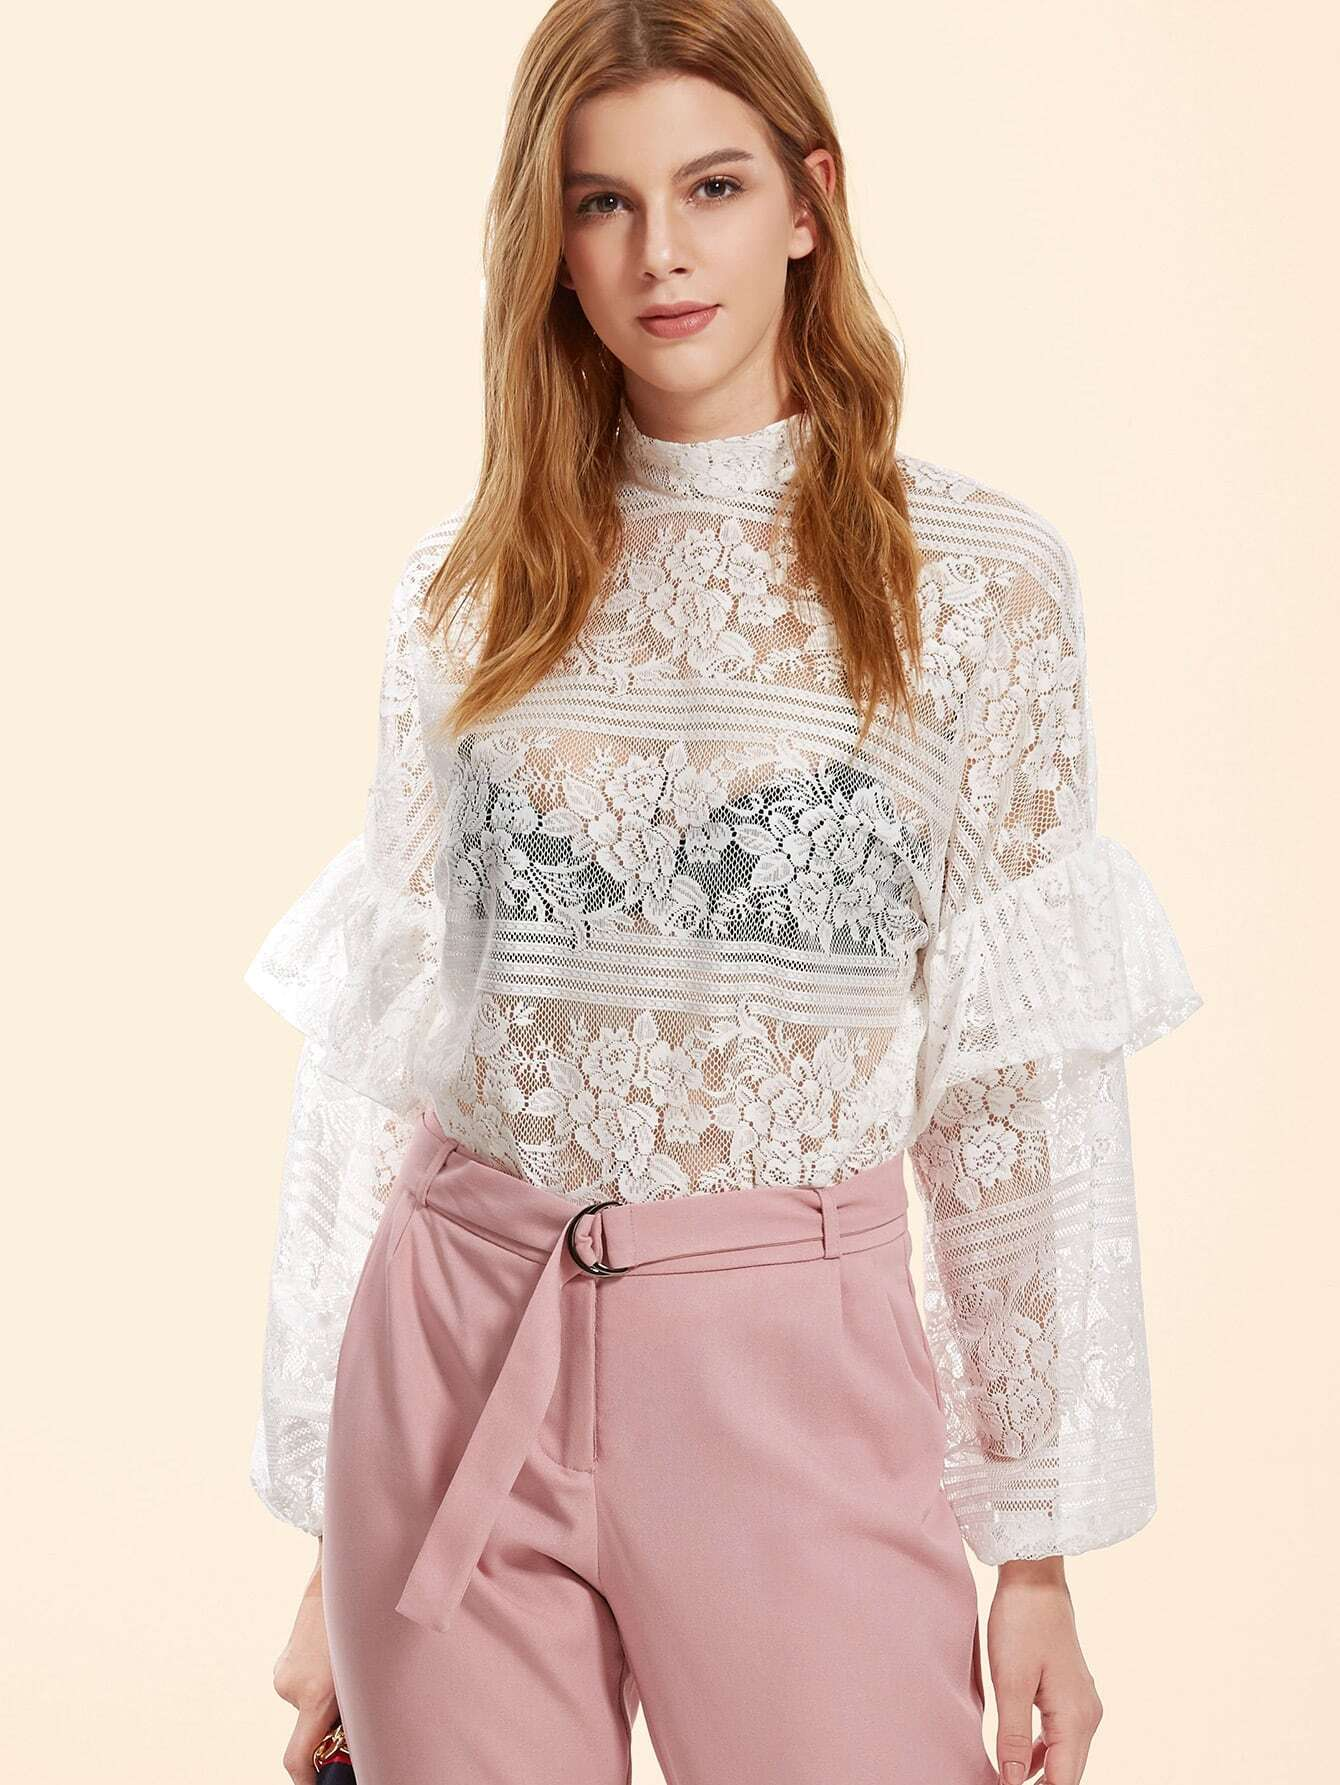 High Neck Frill Trim Floral Lace Top blouse160923707